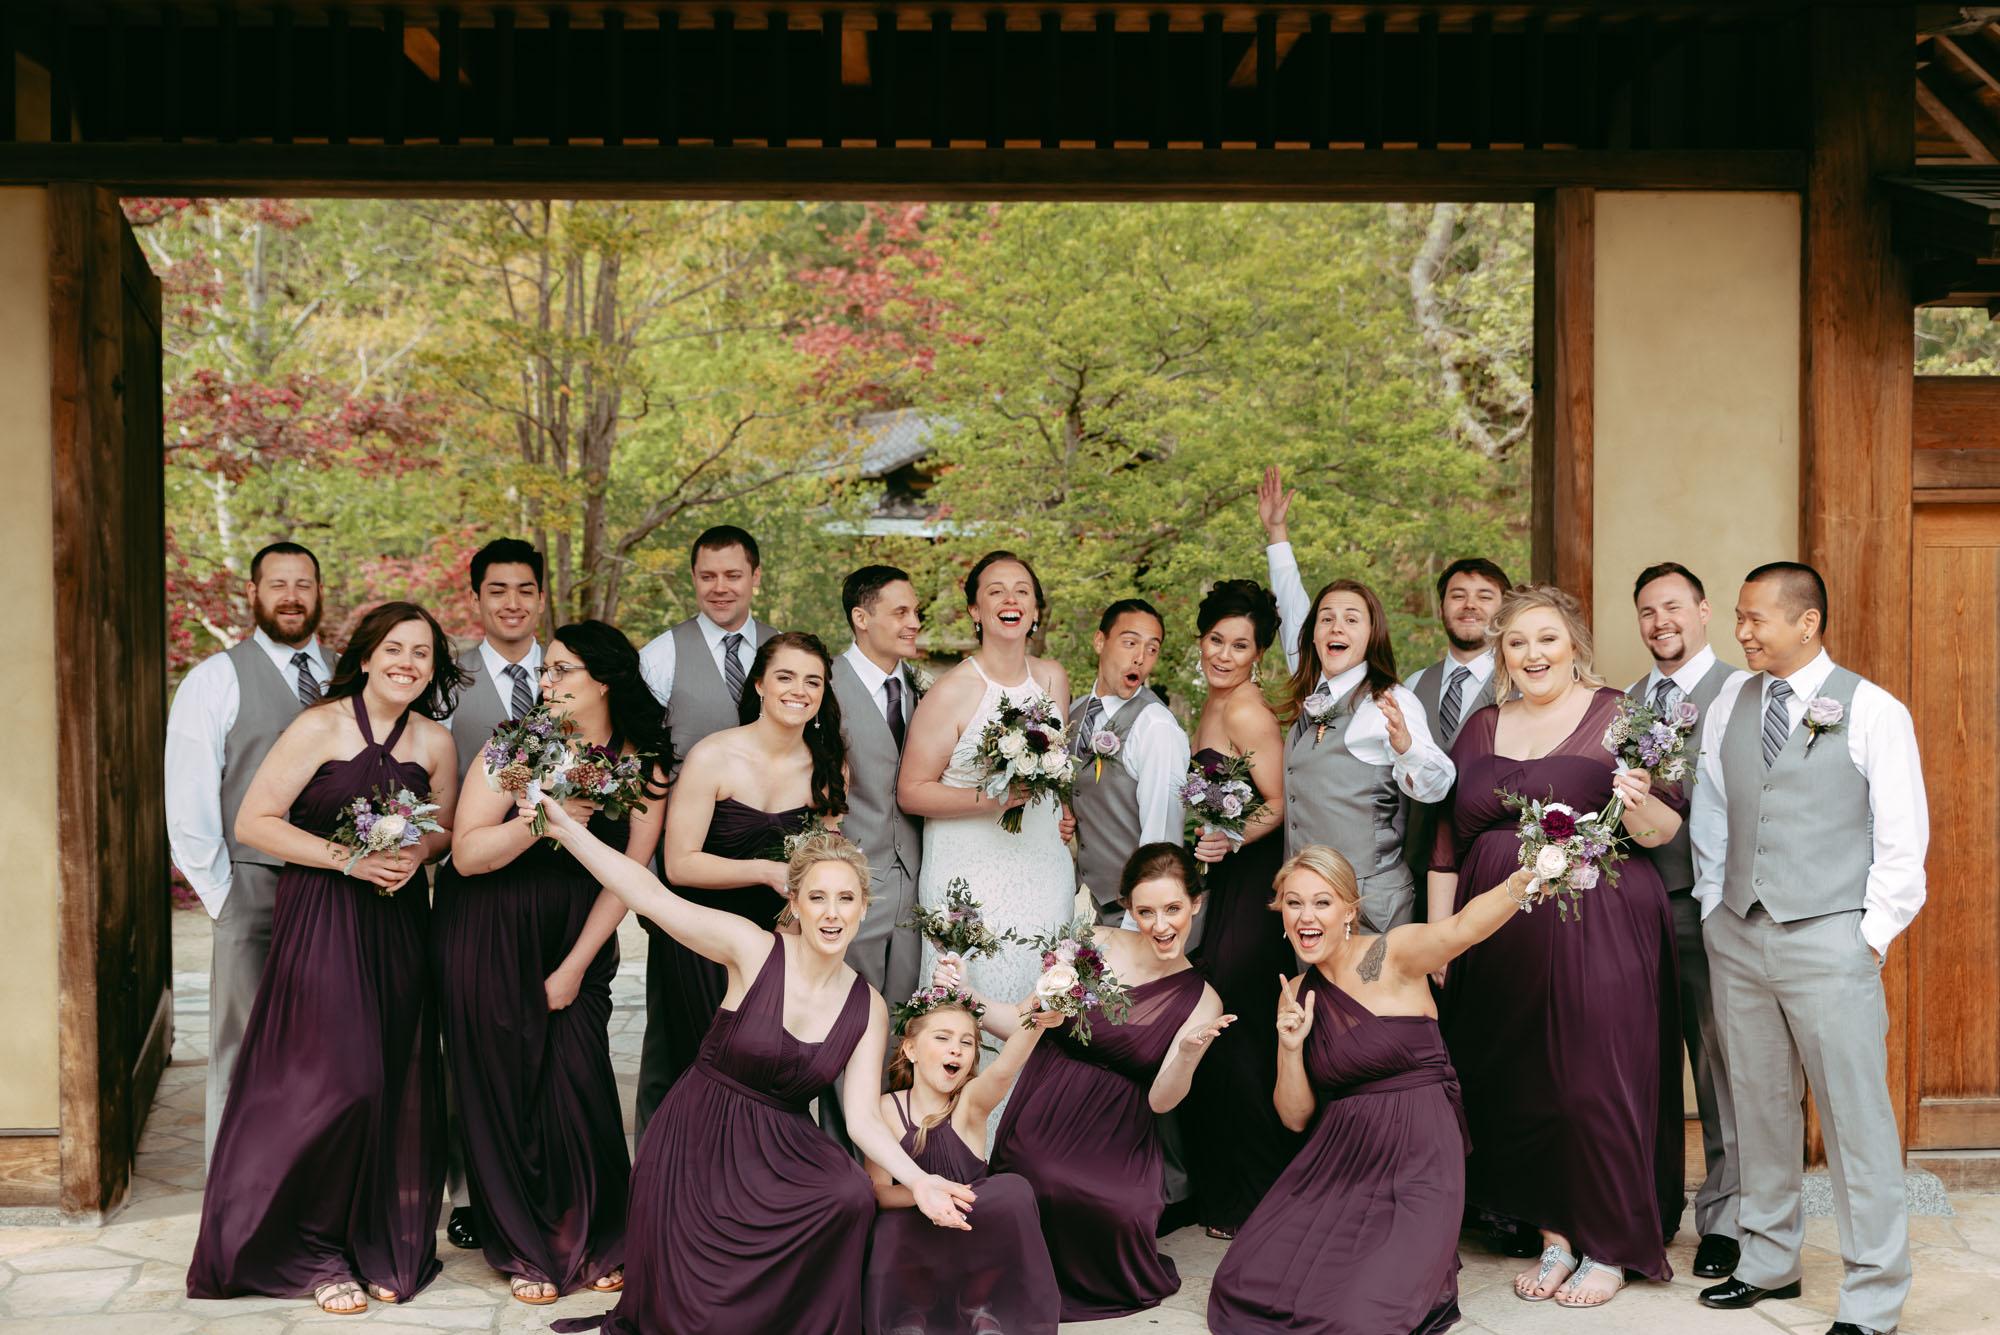 prairie-street-brewhouse-wedding-Rockford-IL-wedding-photographers-154.jpg